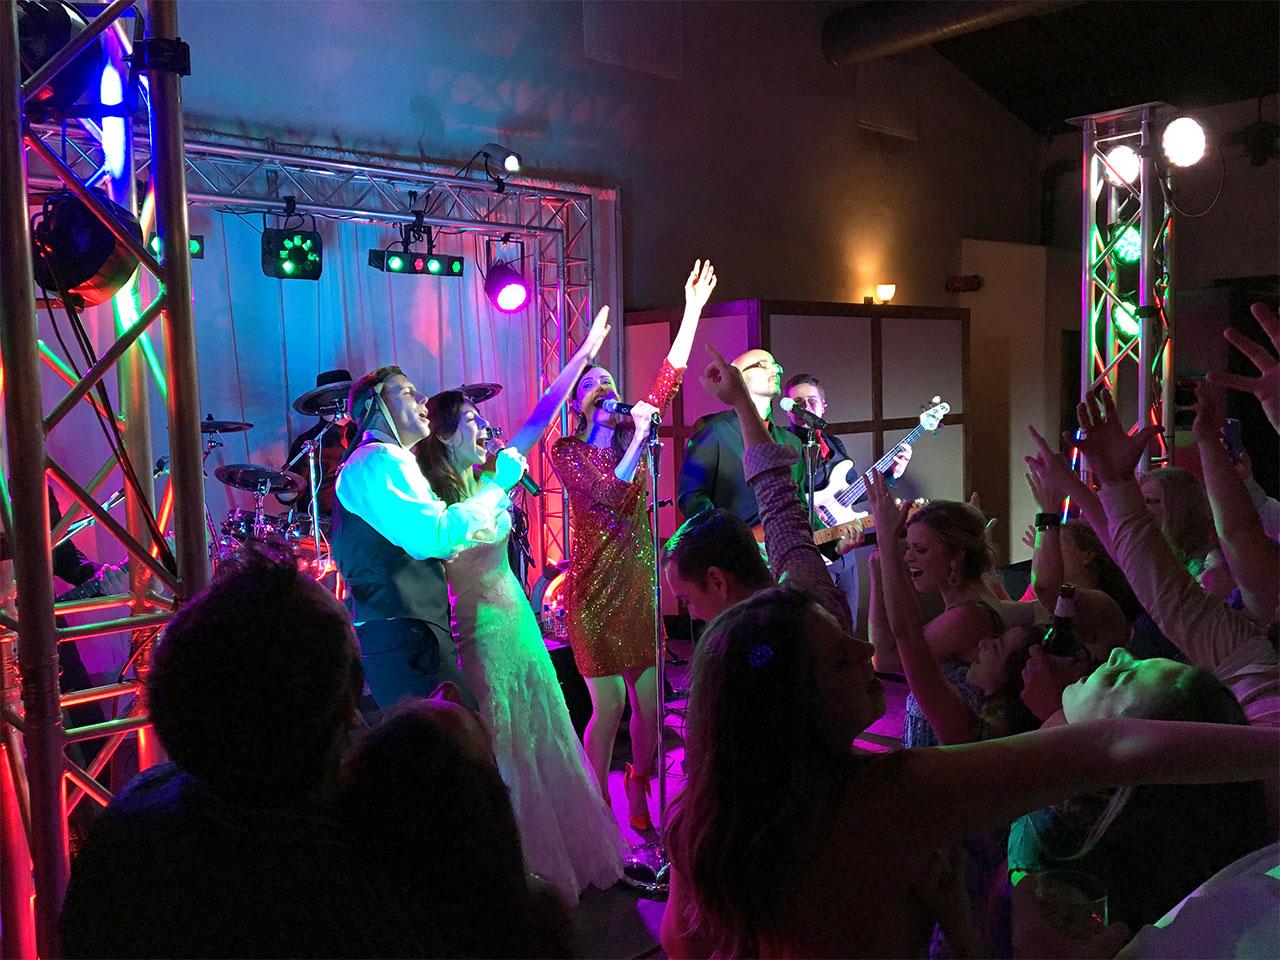 plush_austin_wedding_band_040216.jpg